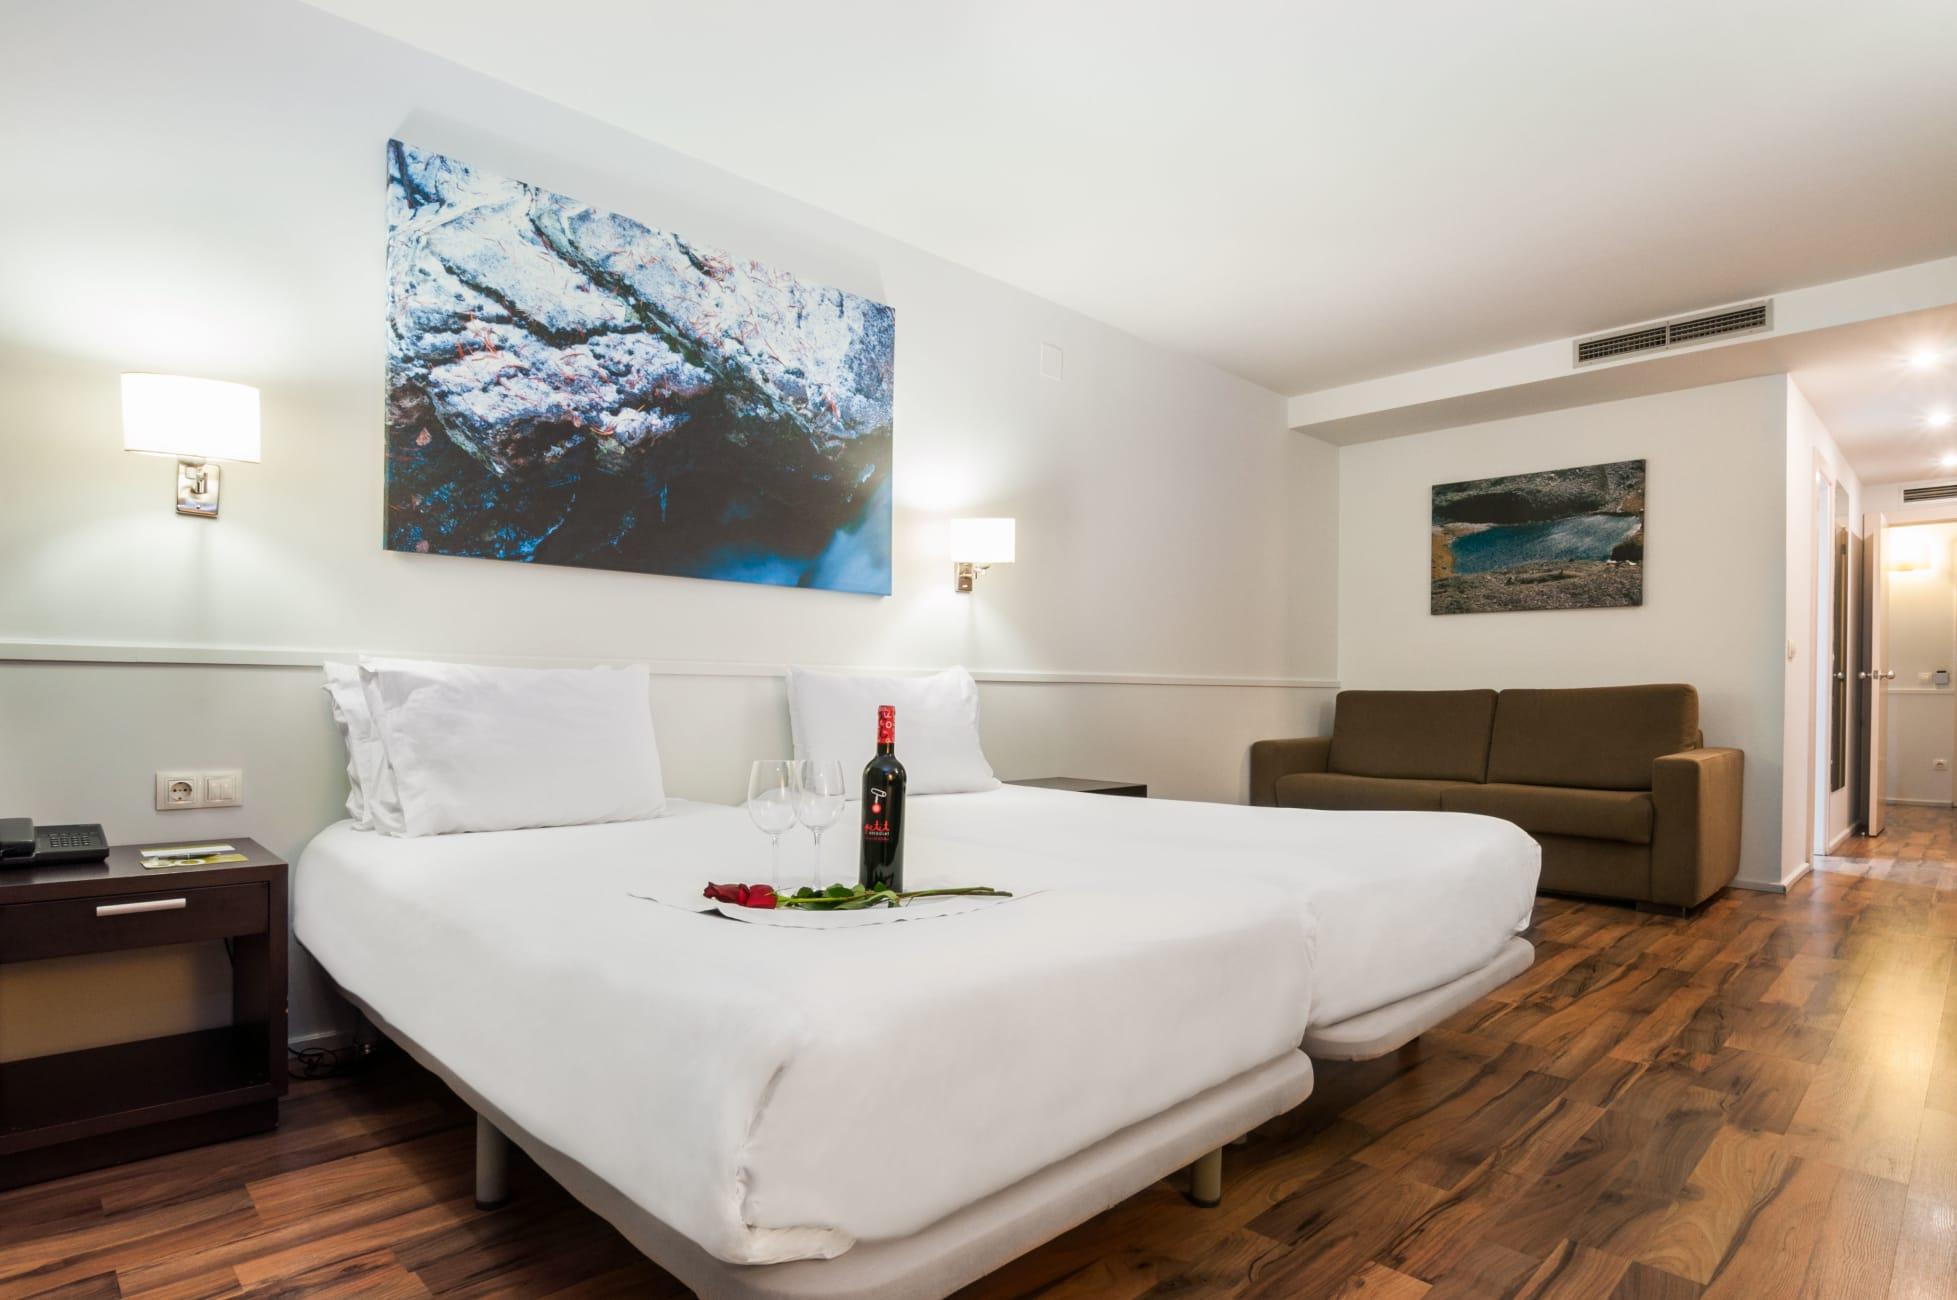 Hotel Hotel Exe Prisma Les Escaldes Trivago Com